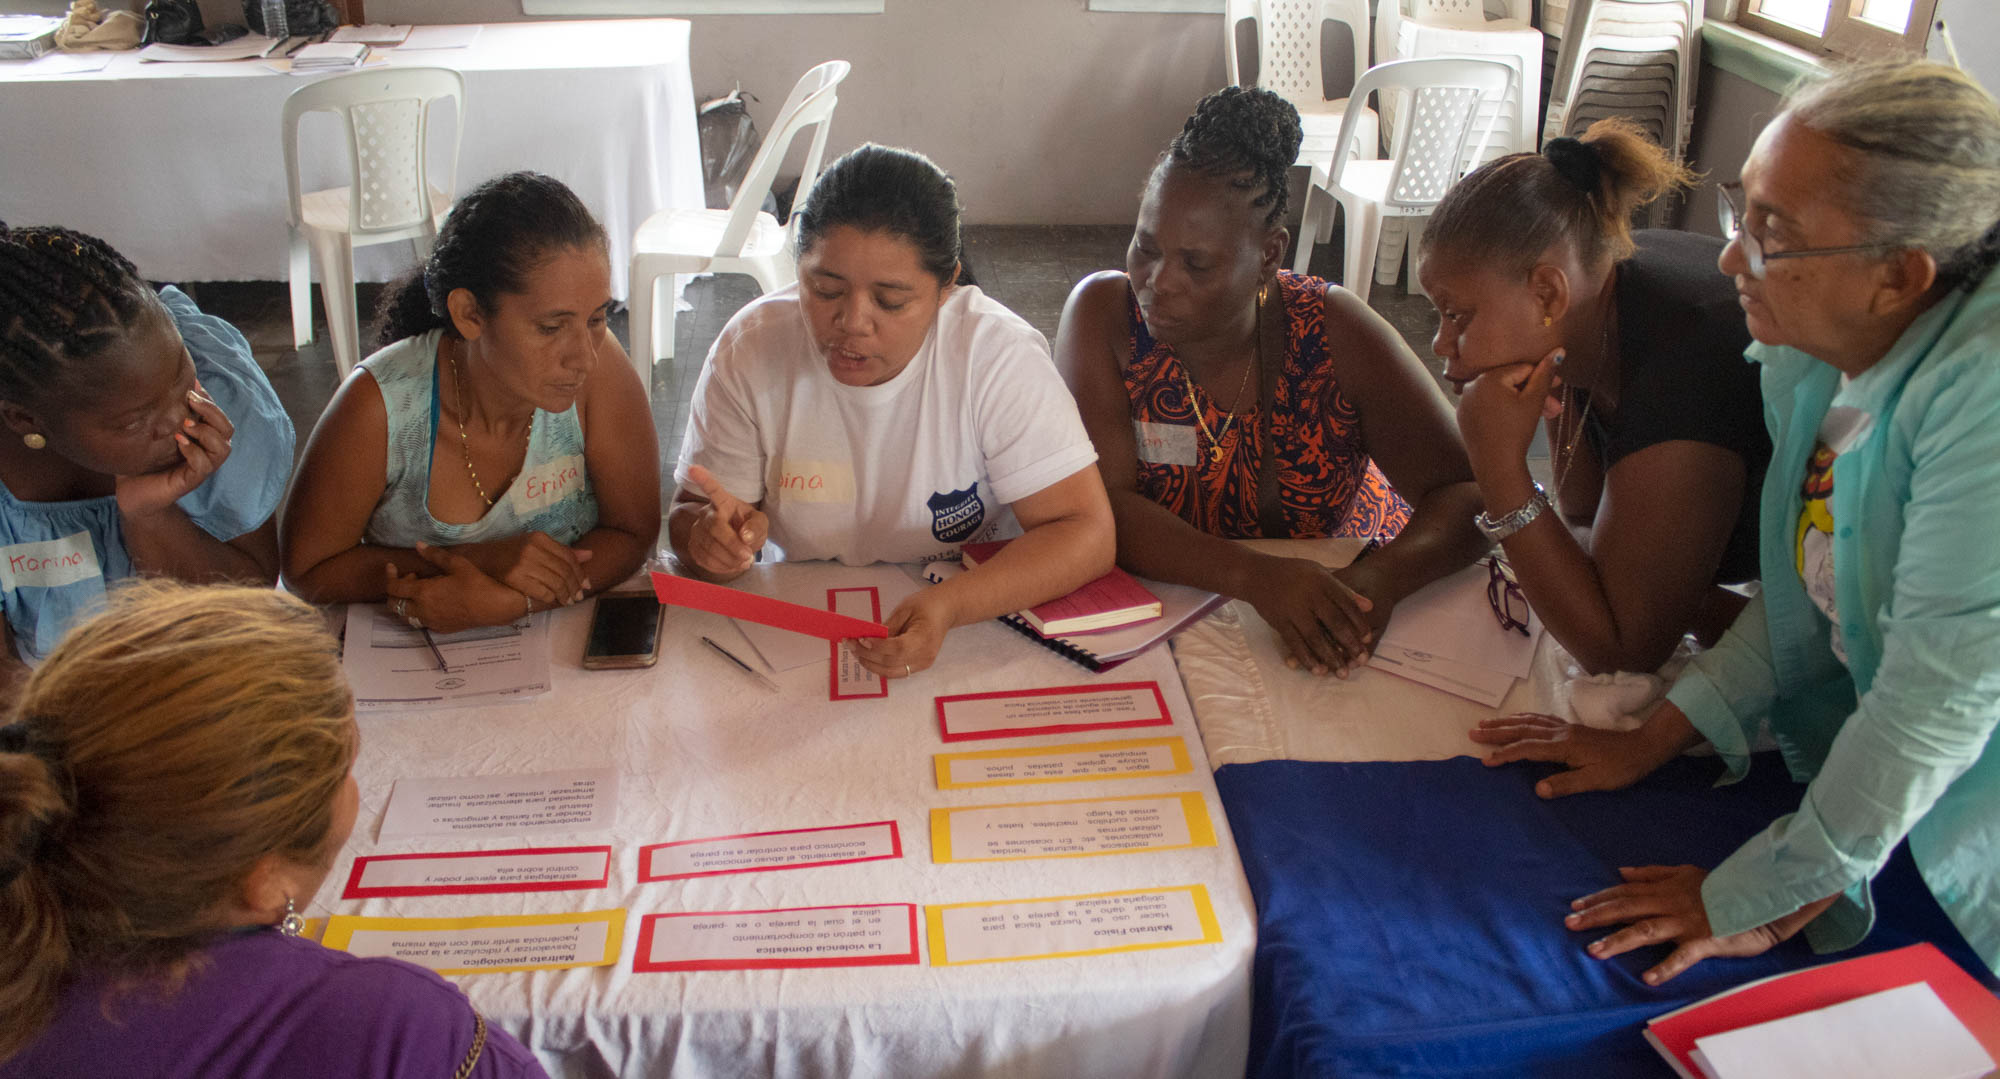 MujeresempoderadasTela (1 of 1)